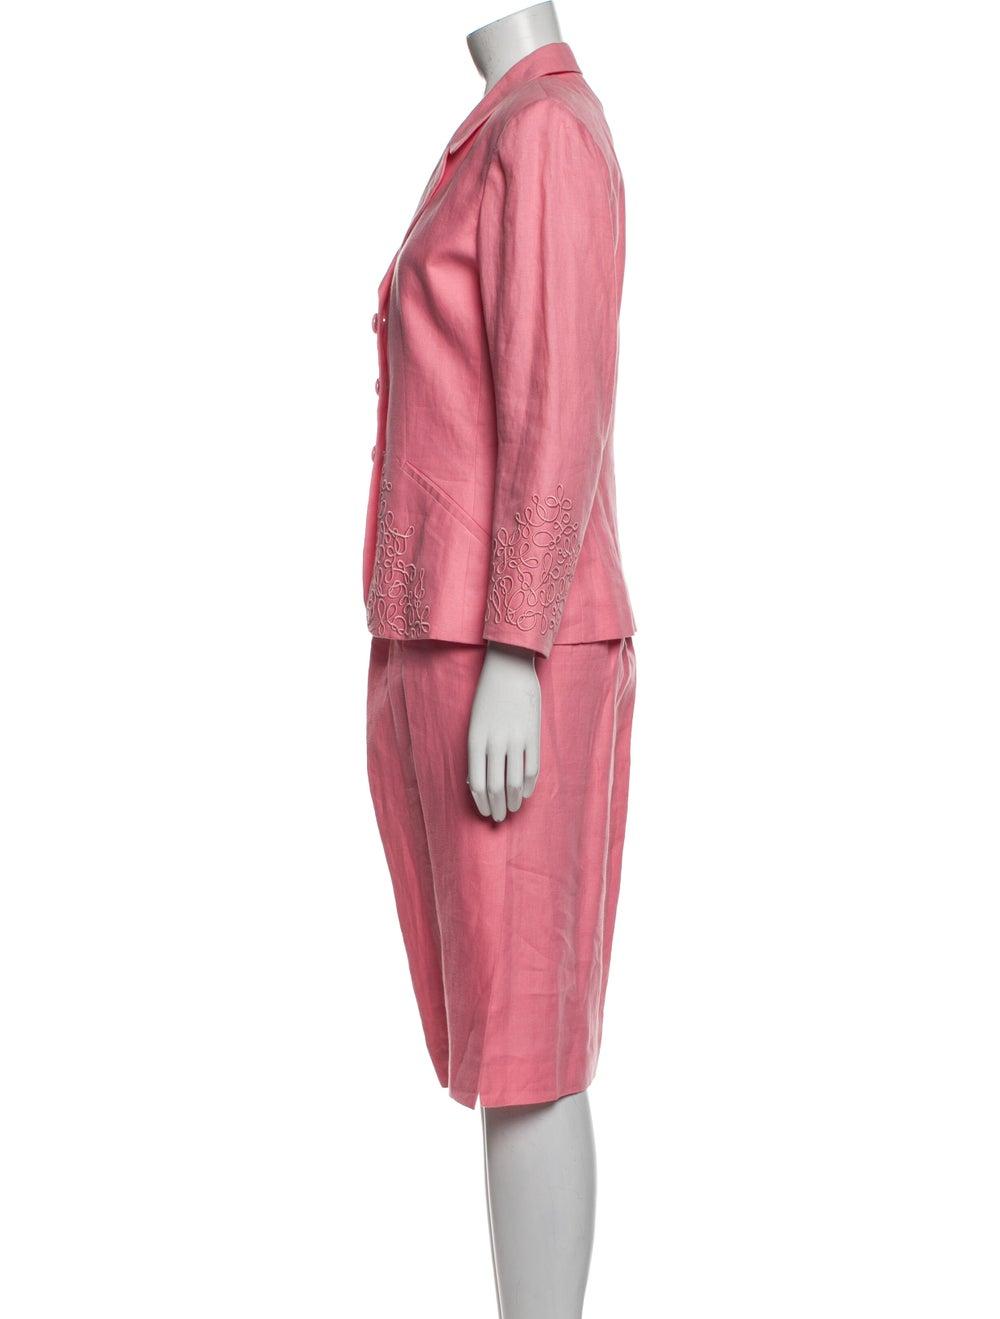 Kenzo Vintage Linen Skirt Suit Pink - image 2